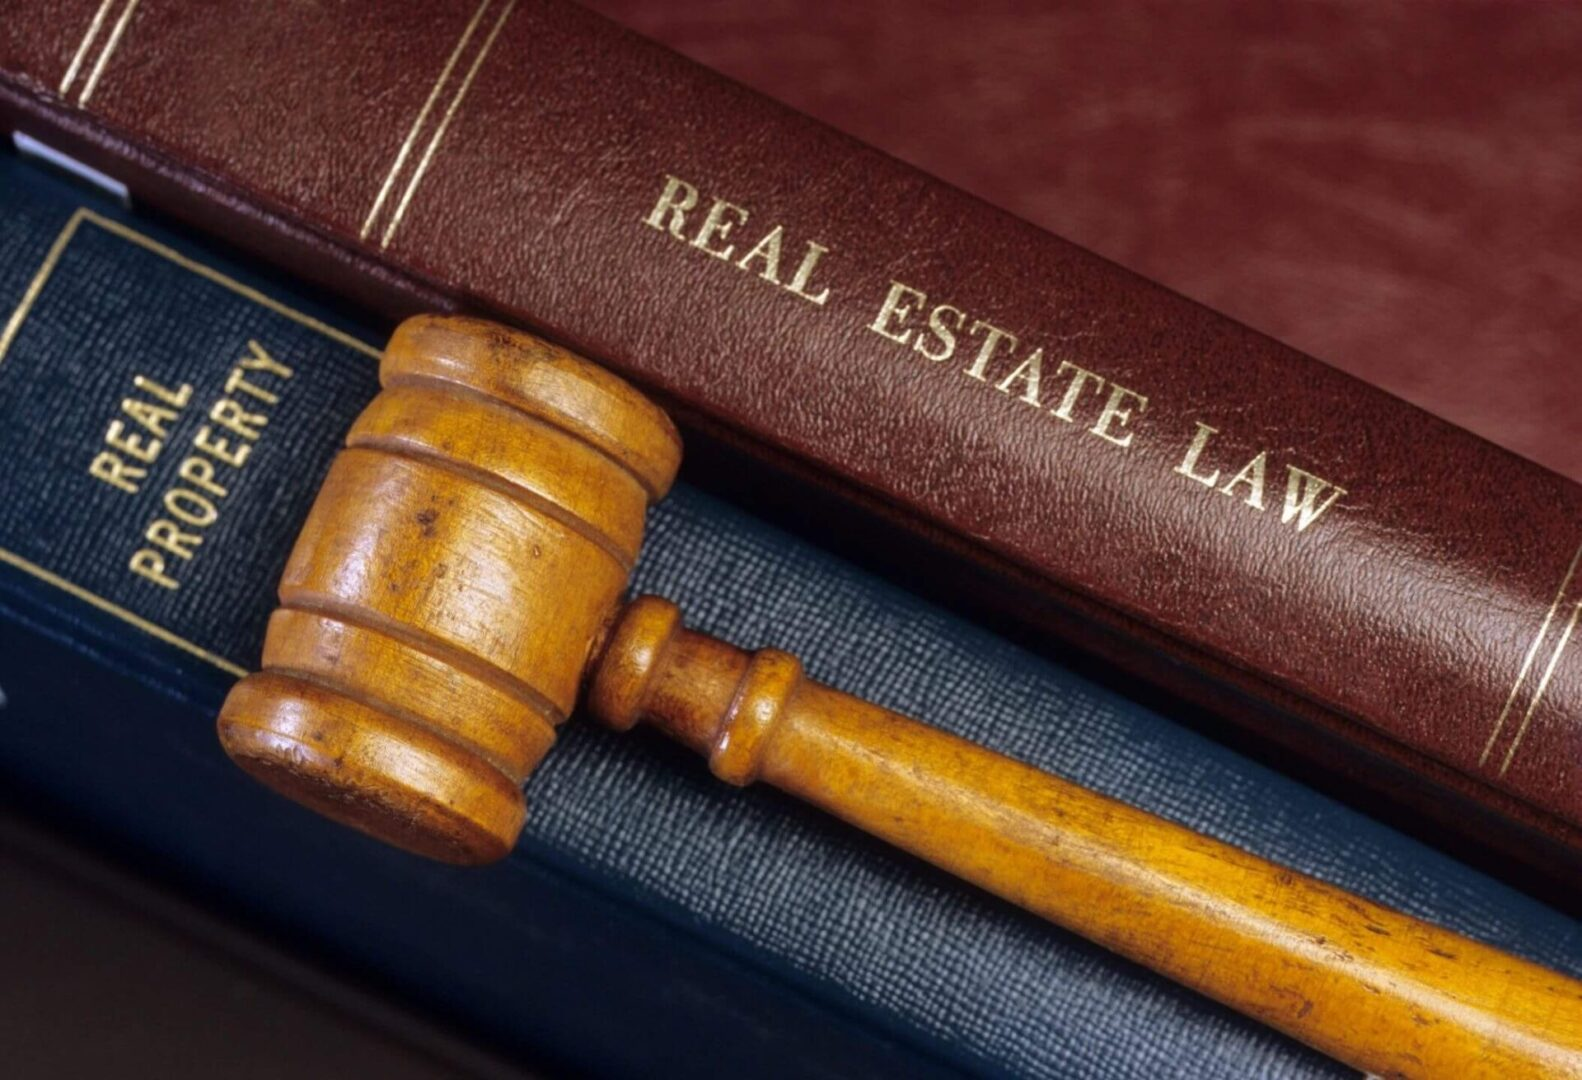 Thomas S. Algeo, Attorney-at-Law PLLC